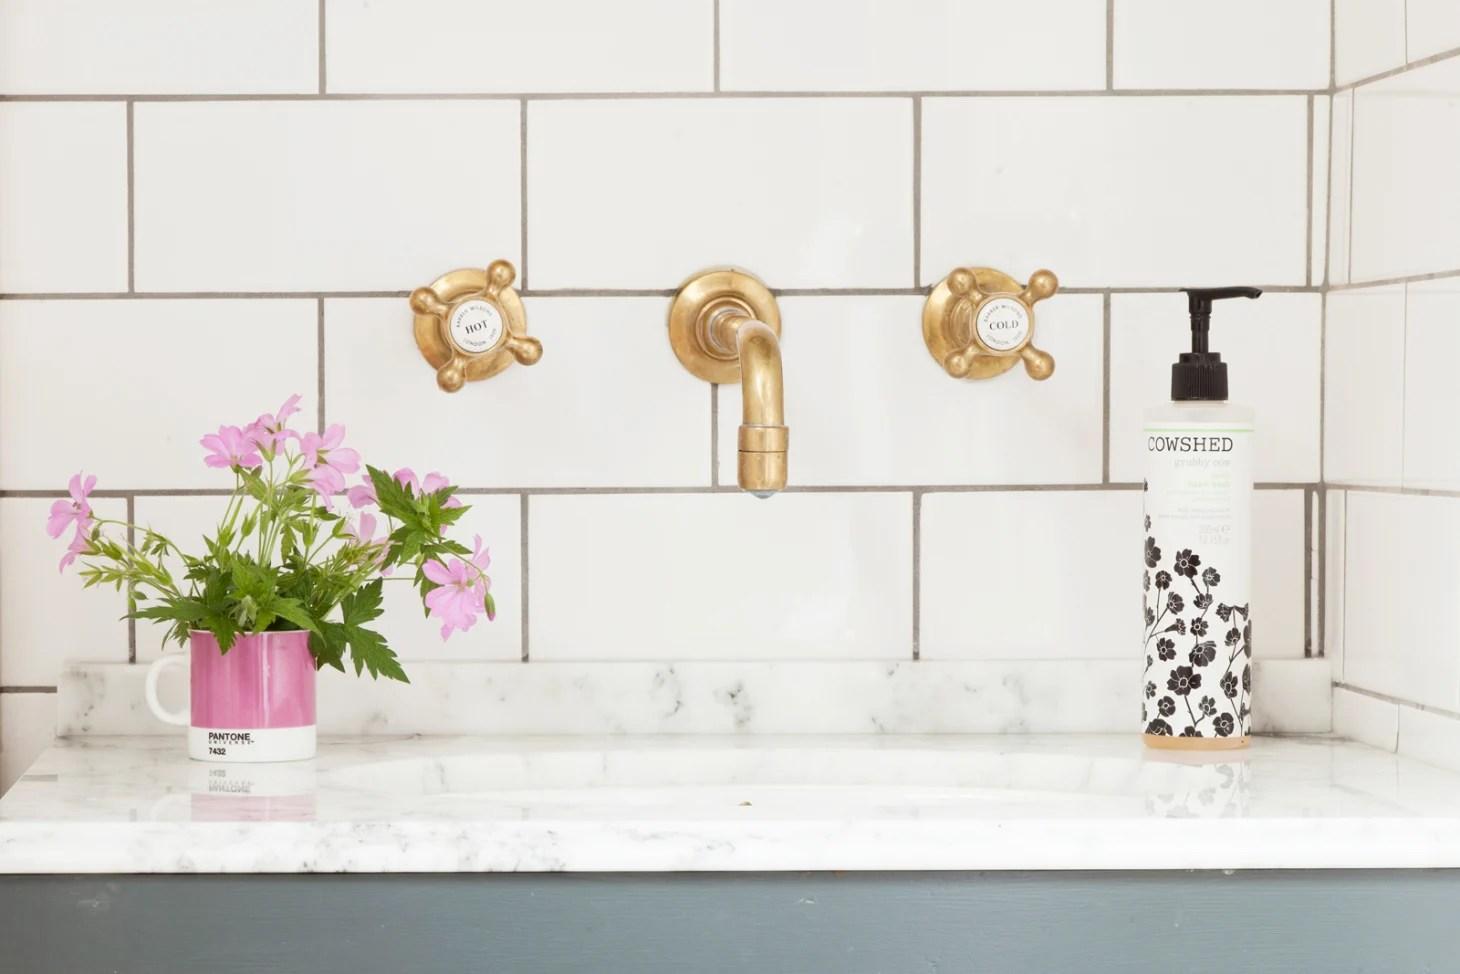 25 Small Bathroom Storage & Design Ideas - Storage ... on Small Apartment Bathroom Storage Ideas  id=43197